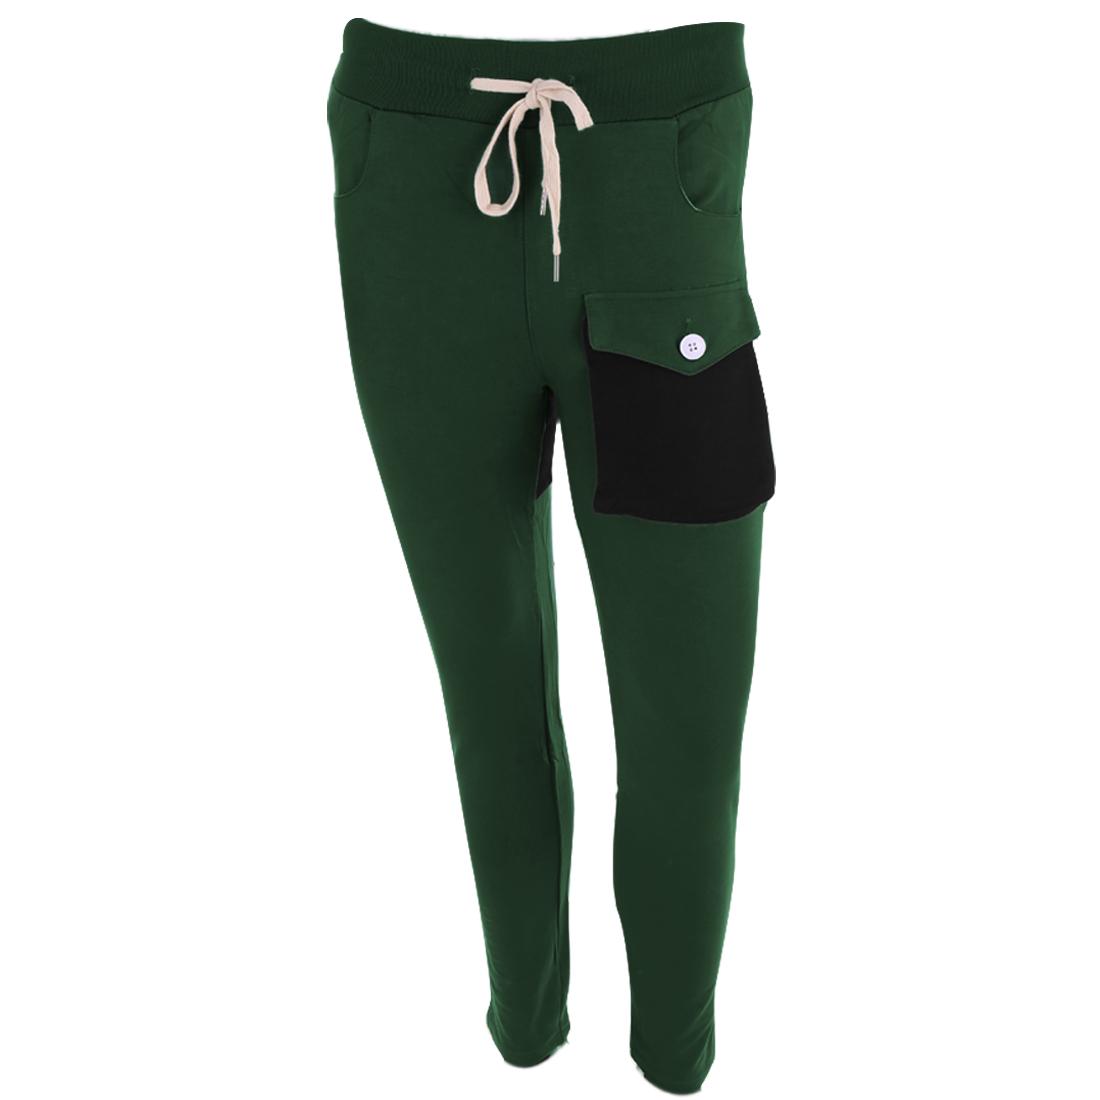 Man Chic Elastic Drawstring Waist Slim Fit Dark Green Casual Pants W28